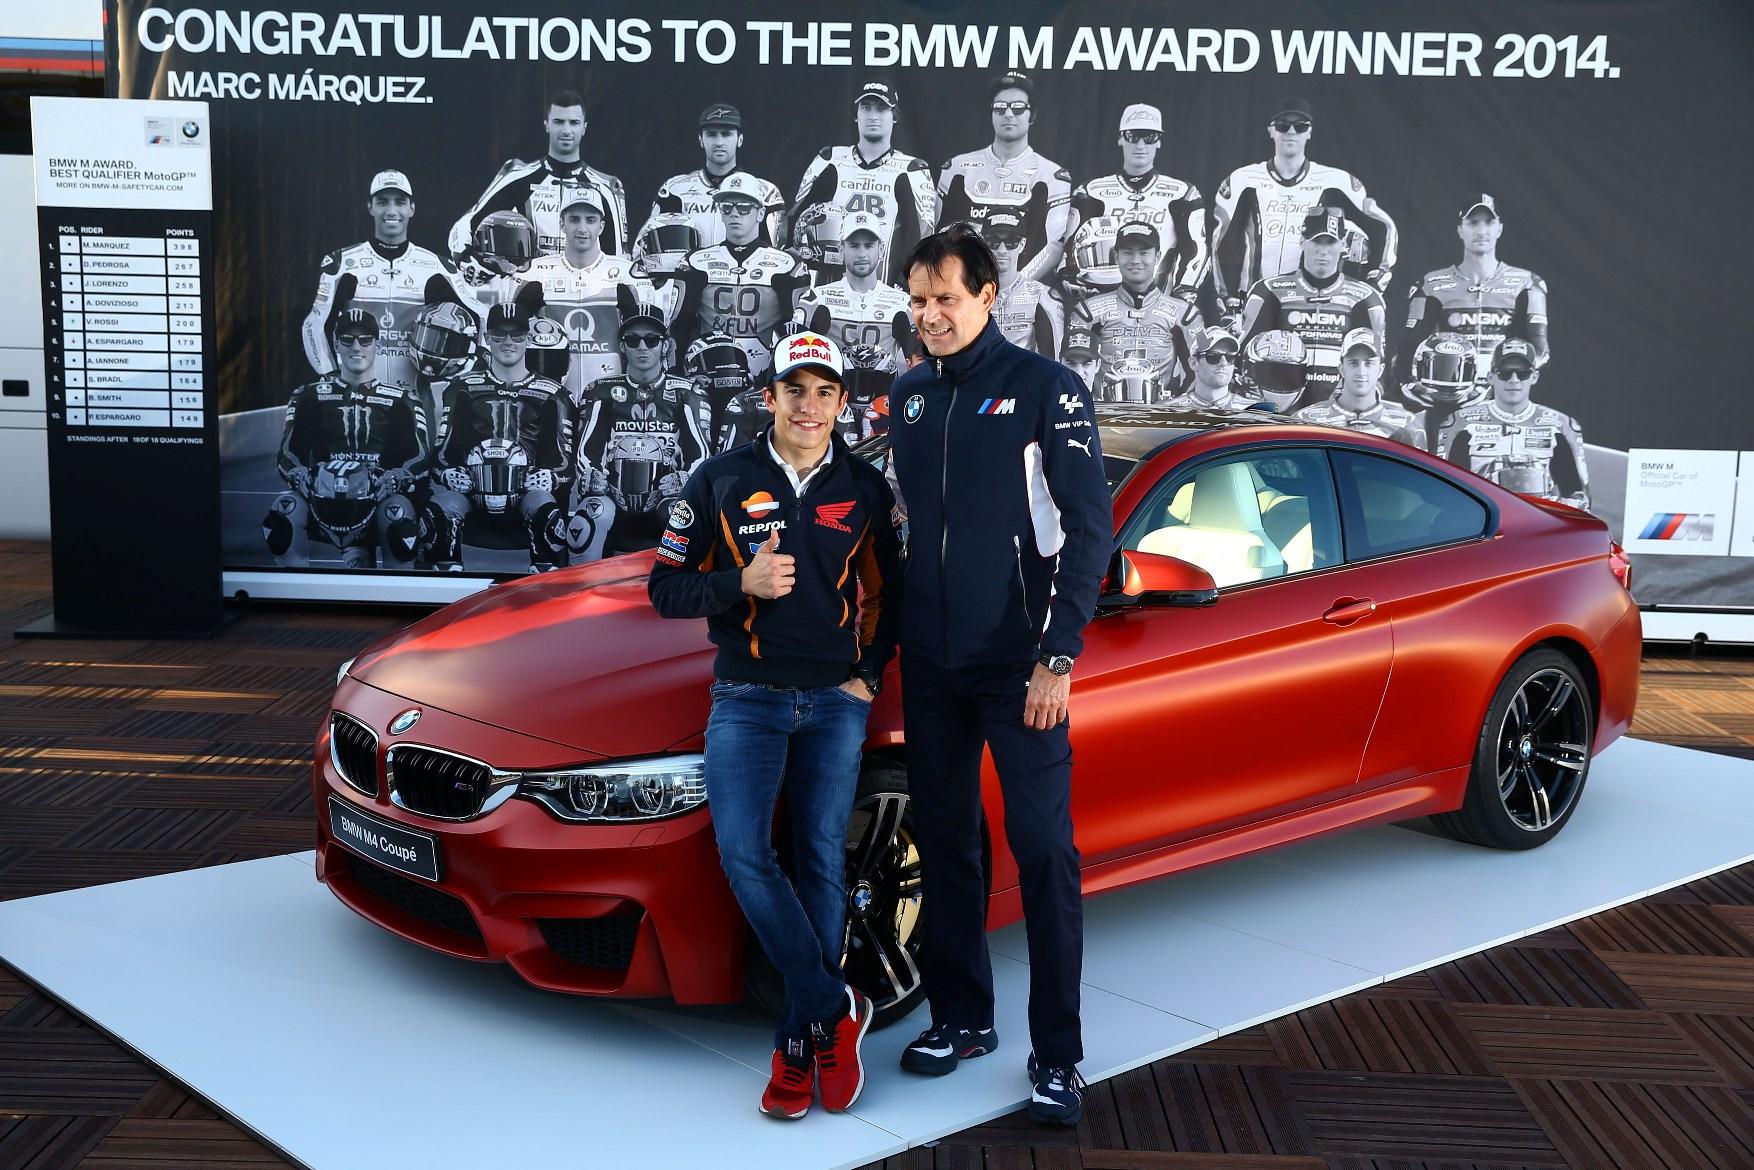 Marc Marquez a castigat pentru a doua oara consecutiv trofeul BMW M Award